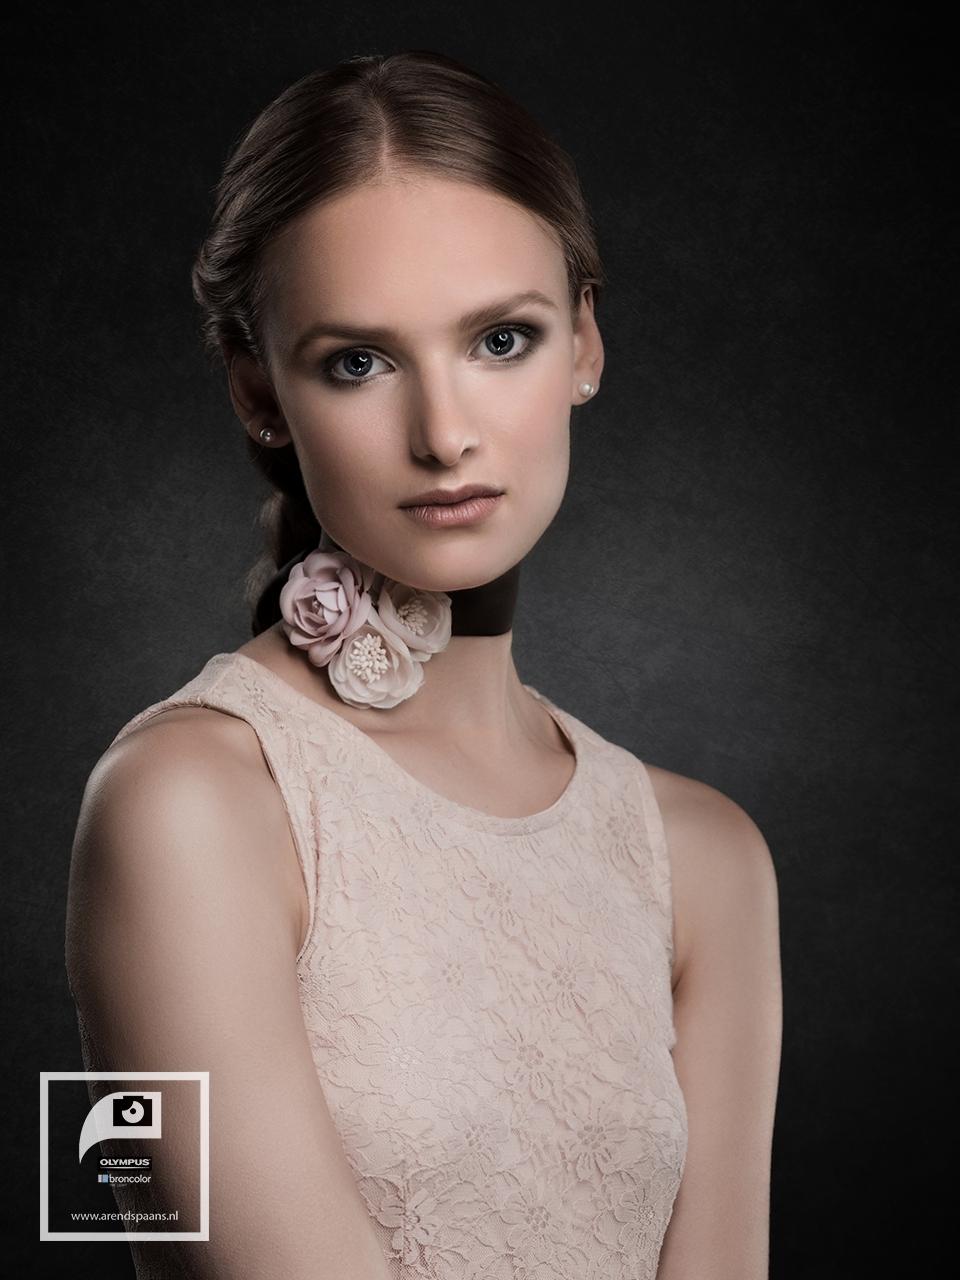 Model: Lois MUA: Priscilla Fotografie: Arend Spaans